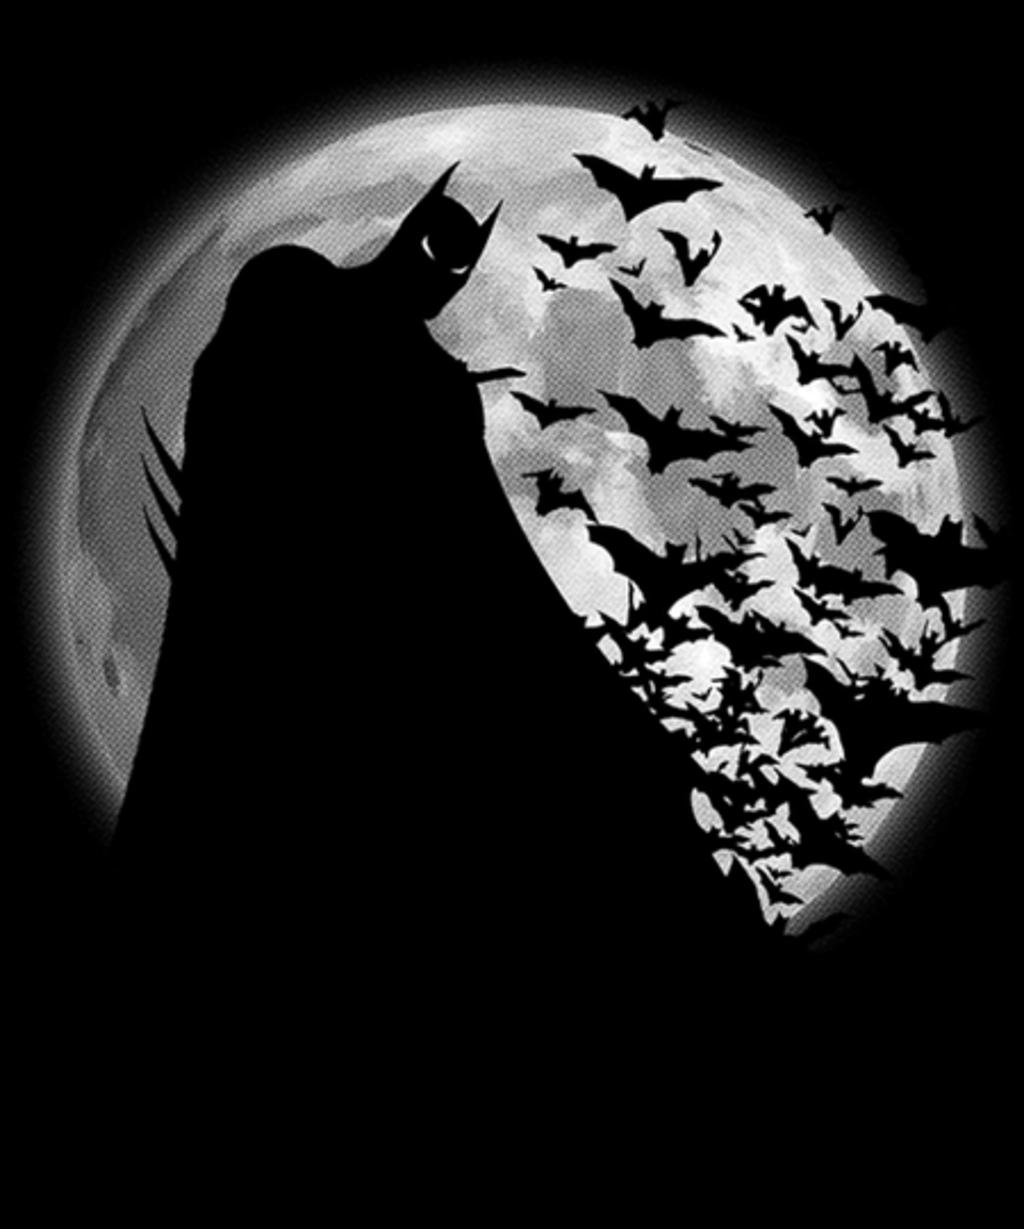 Qwertee: Shadow under the moon